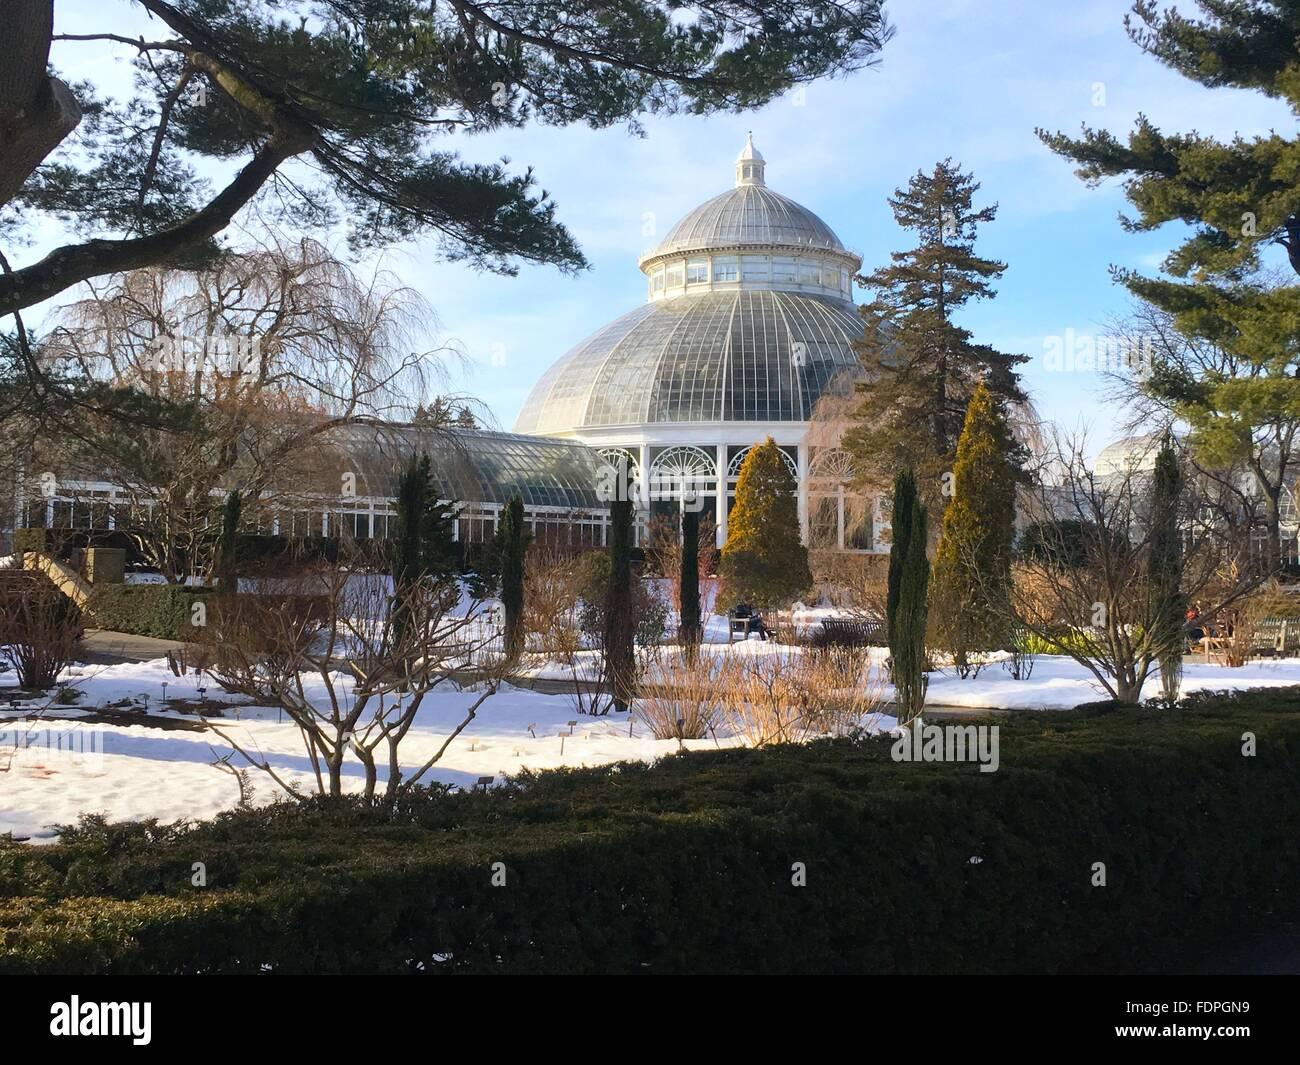 Greenhouse At The New York Botanical Garden Winter Scene Stock